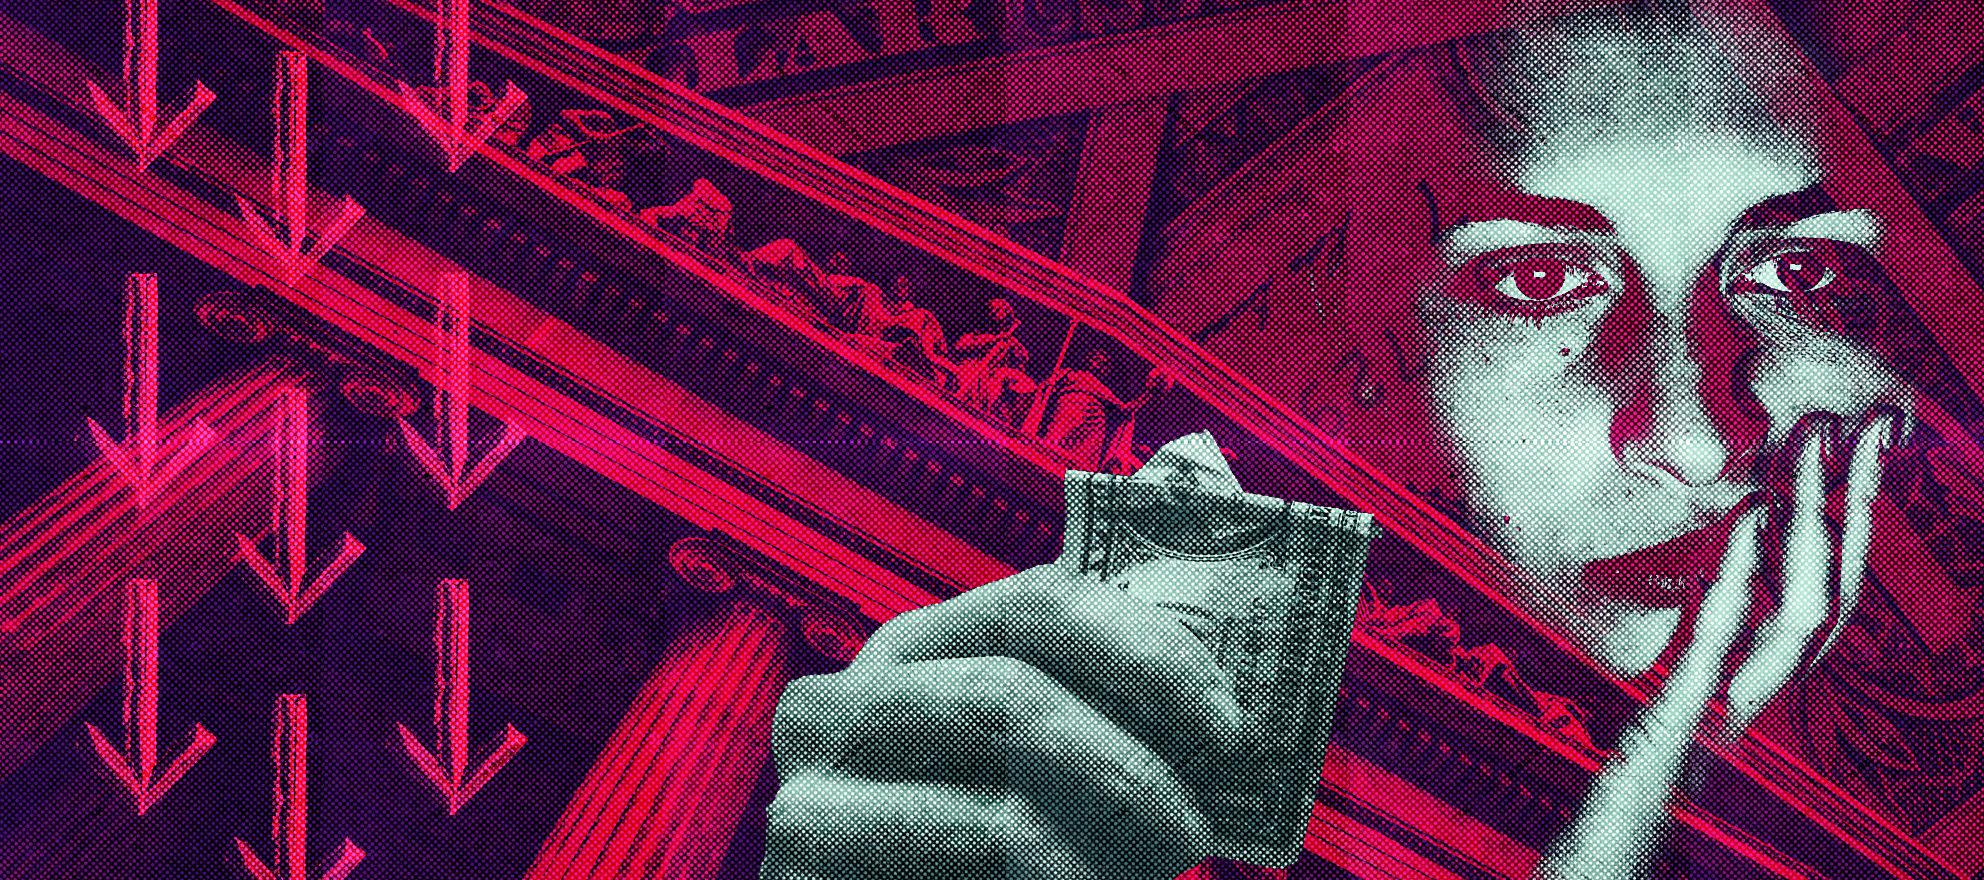 Bombshell lawsuit could wreak havoc for buyers